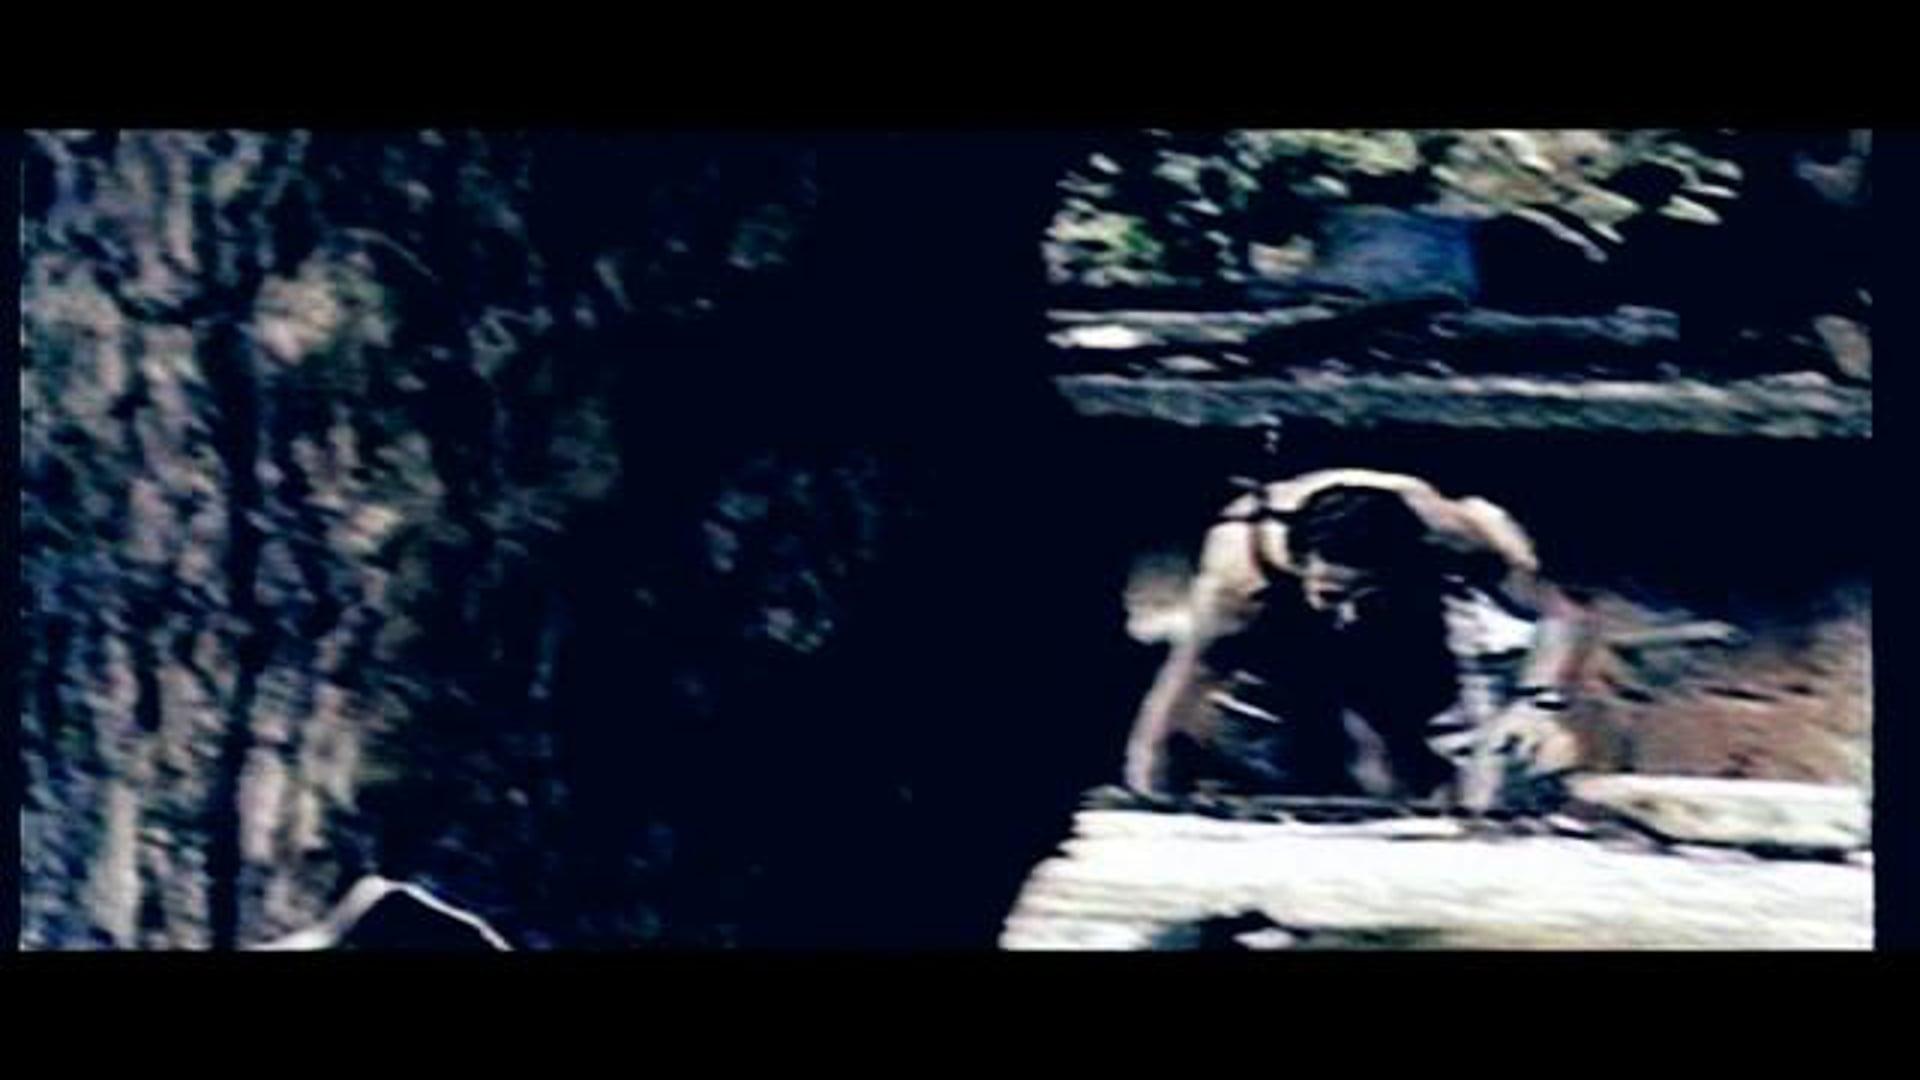 PAÓ - sem palavras | Curta-metragem